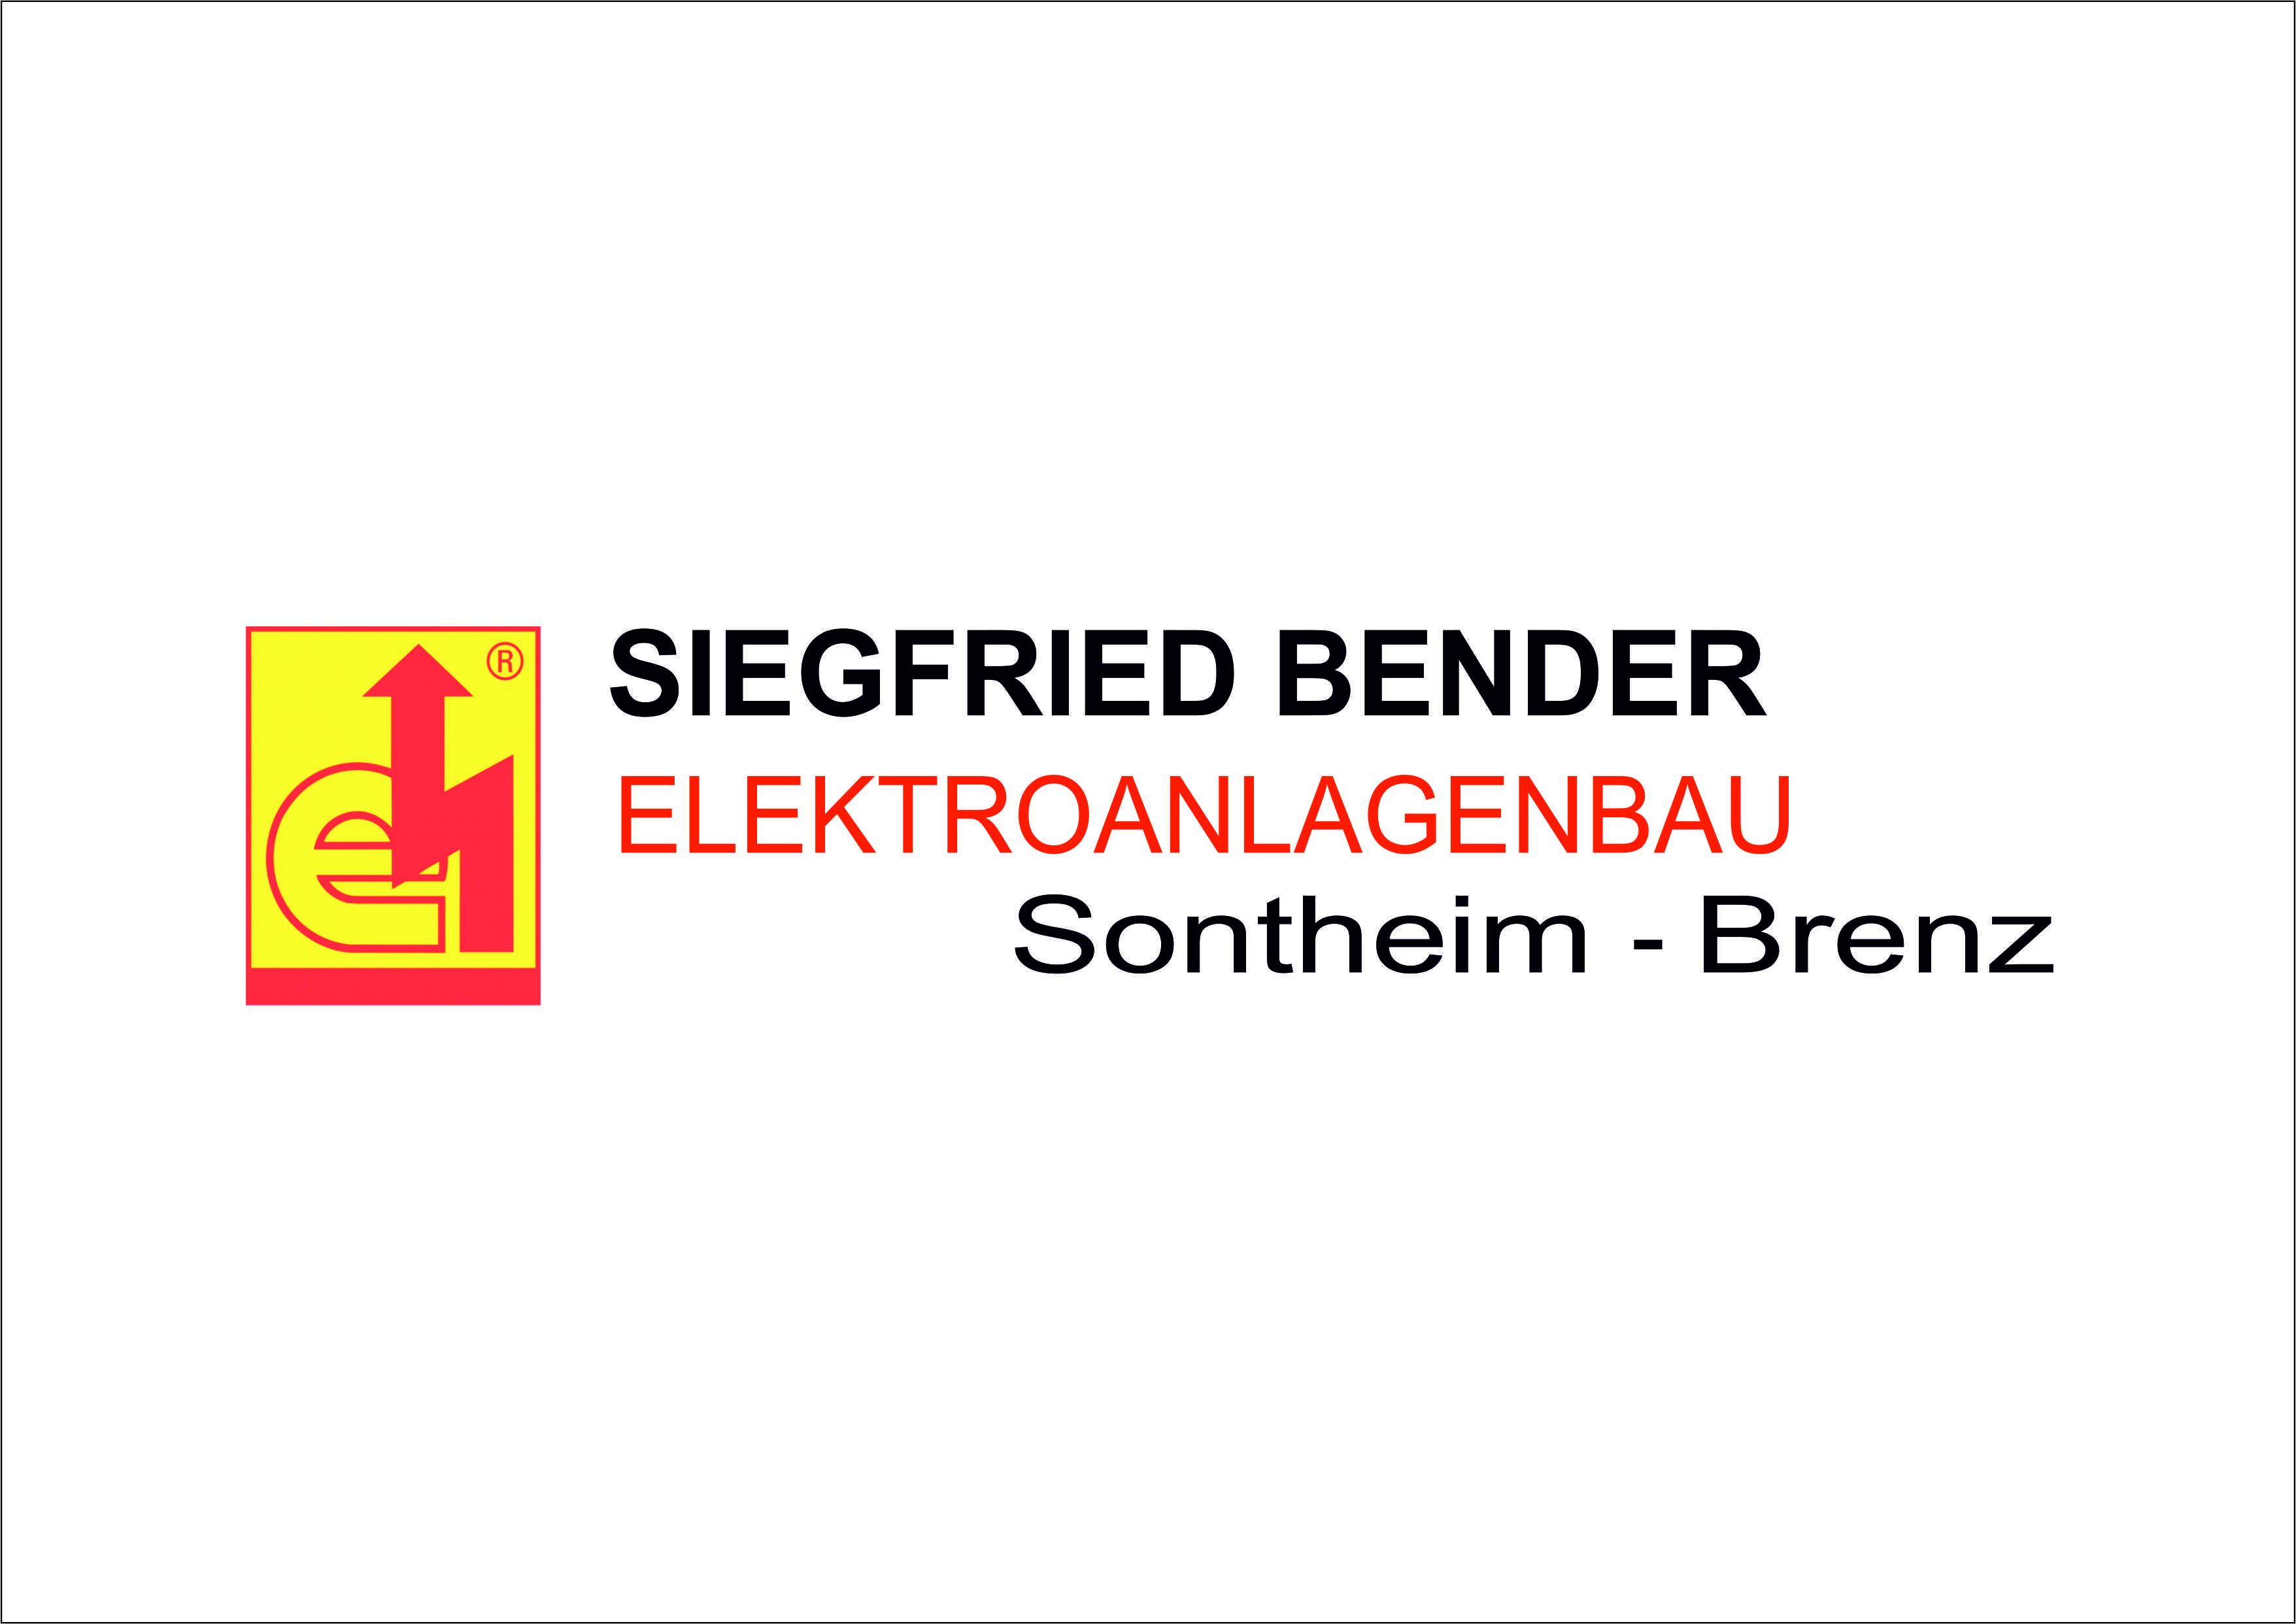 Siegfried Bender